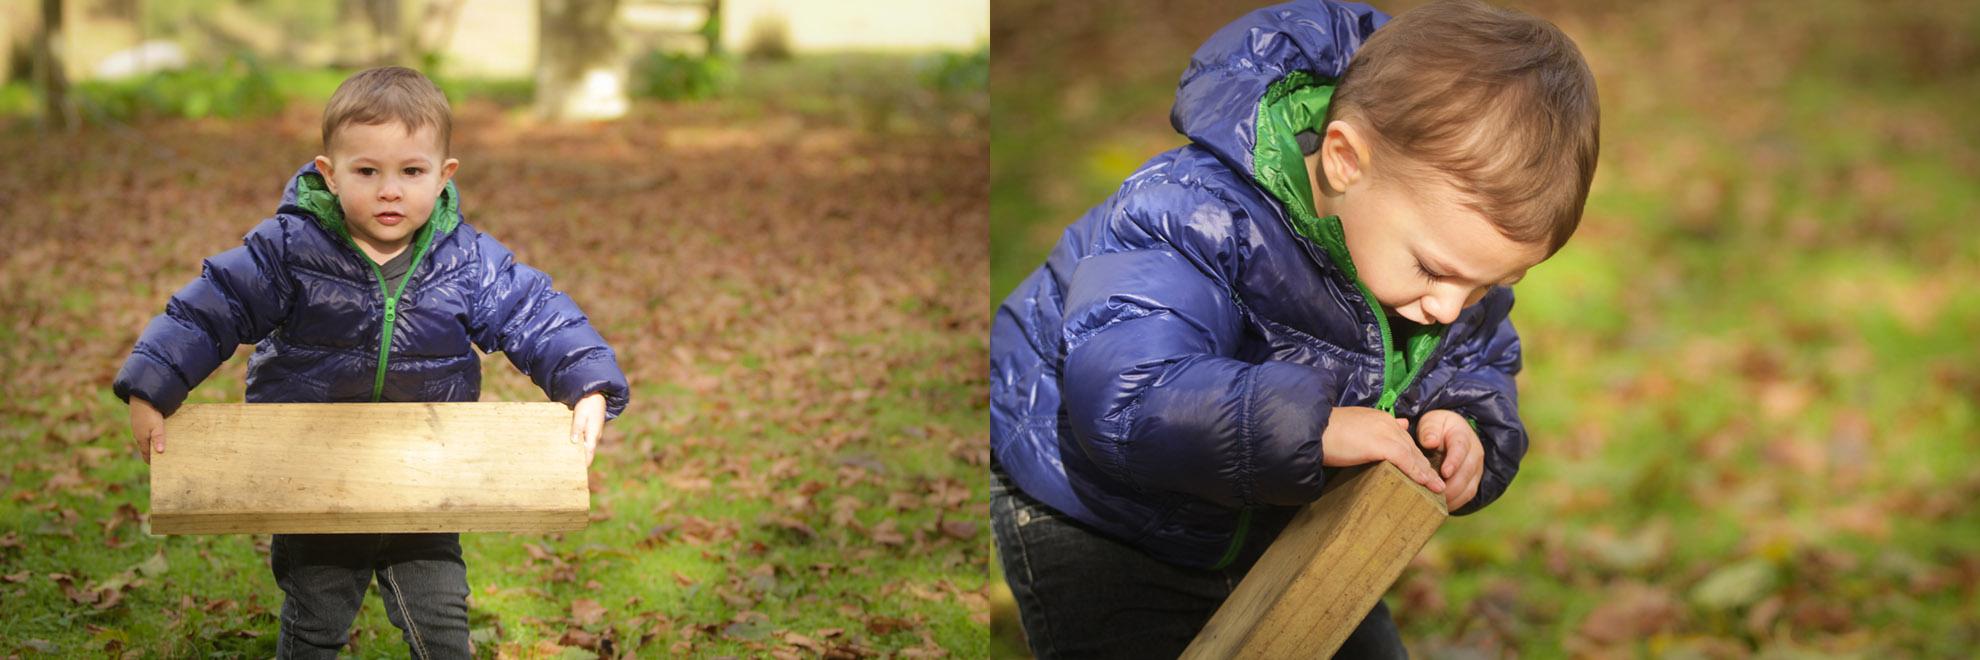 Hamilton-childrens-photographer-outdoor-session.jpg